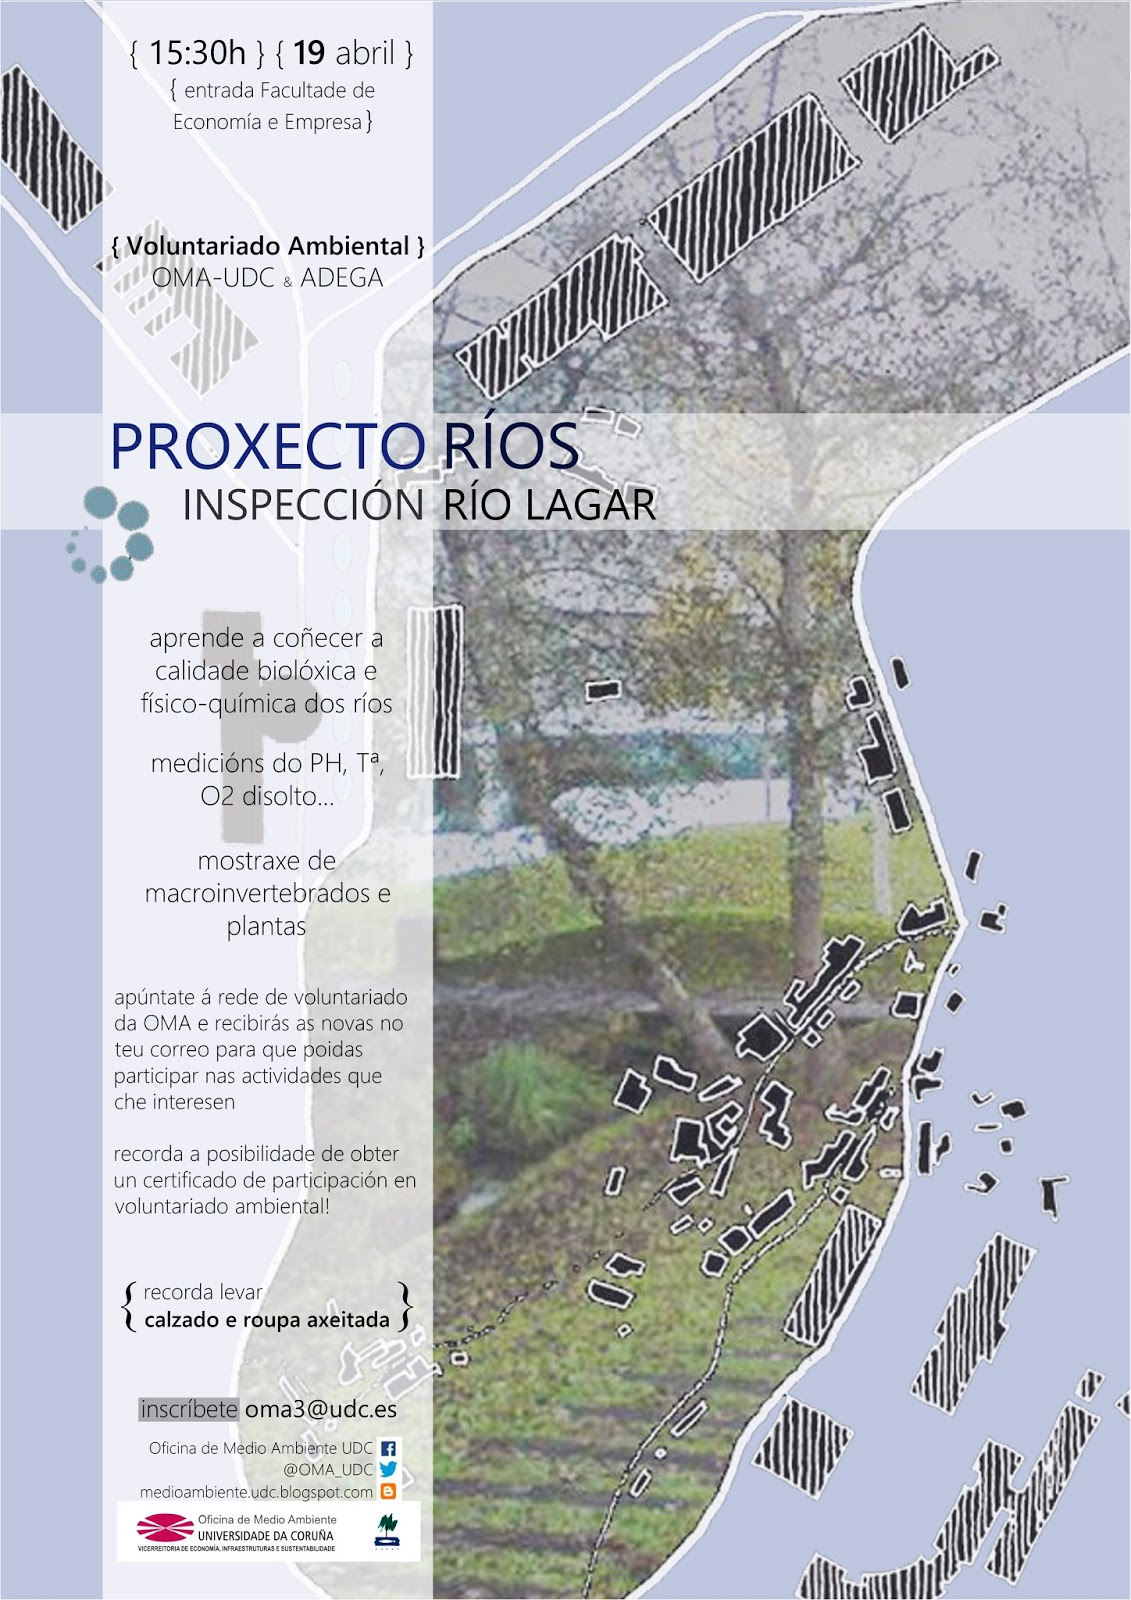 Proxecto rios primavera oficina de medio ambiente for Oficina de medio ambiente